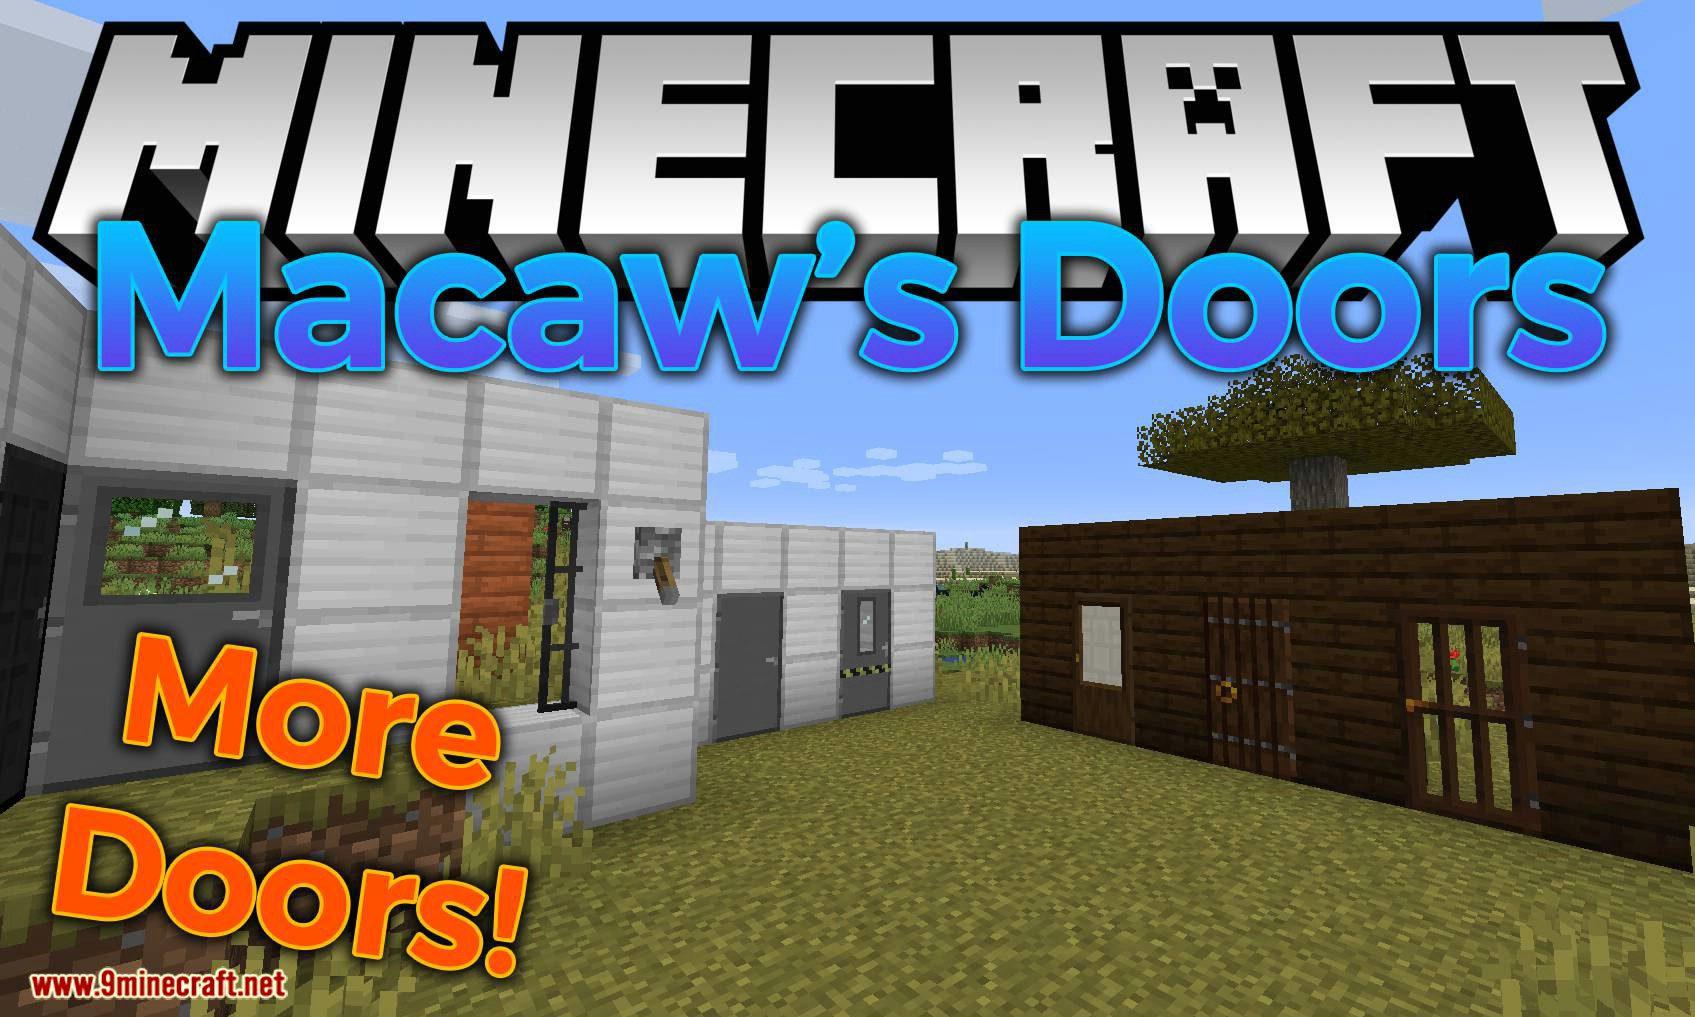 Macaw_s Doors mod for minecraft logo